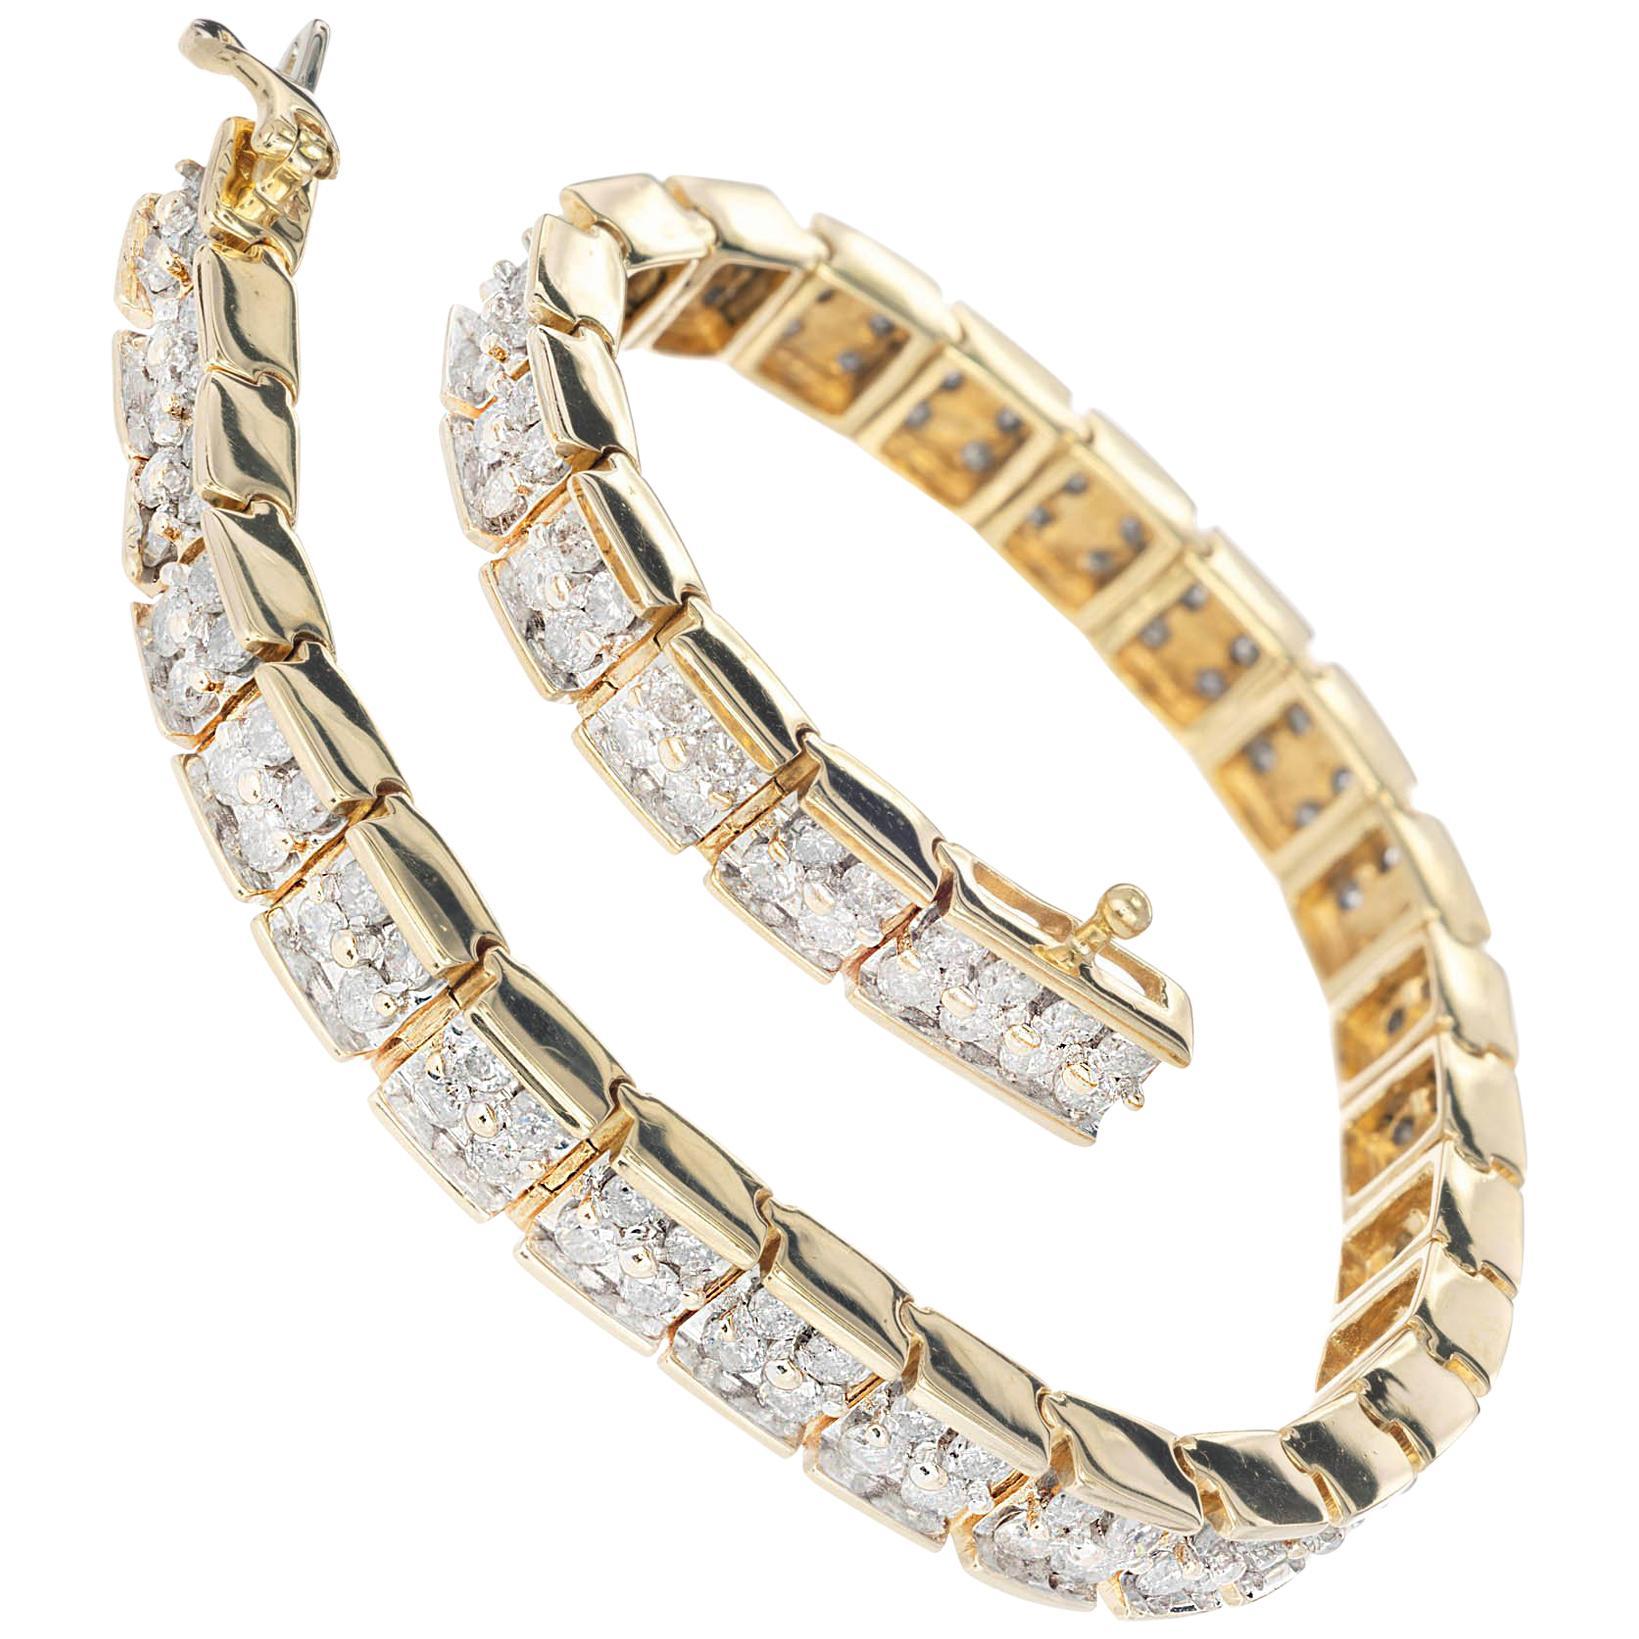 4.00 Carat Full Cut Diamond Two-Row Hinged Link Bracelet